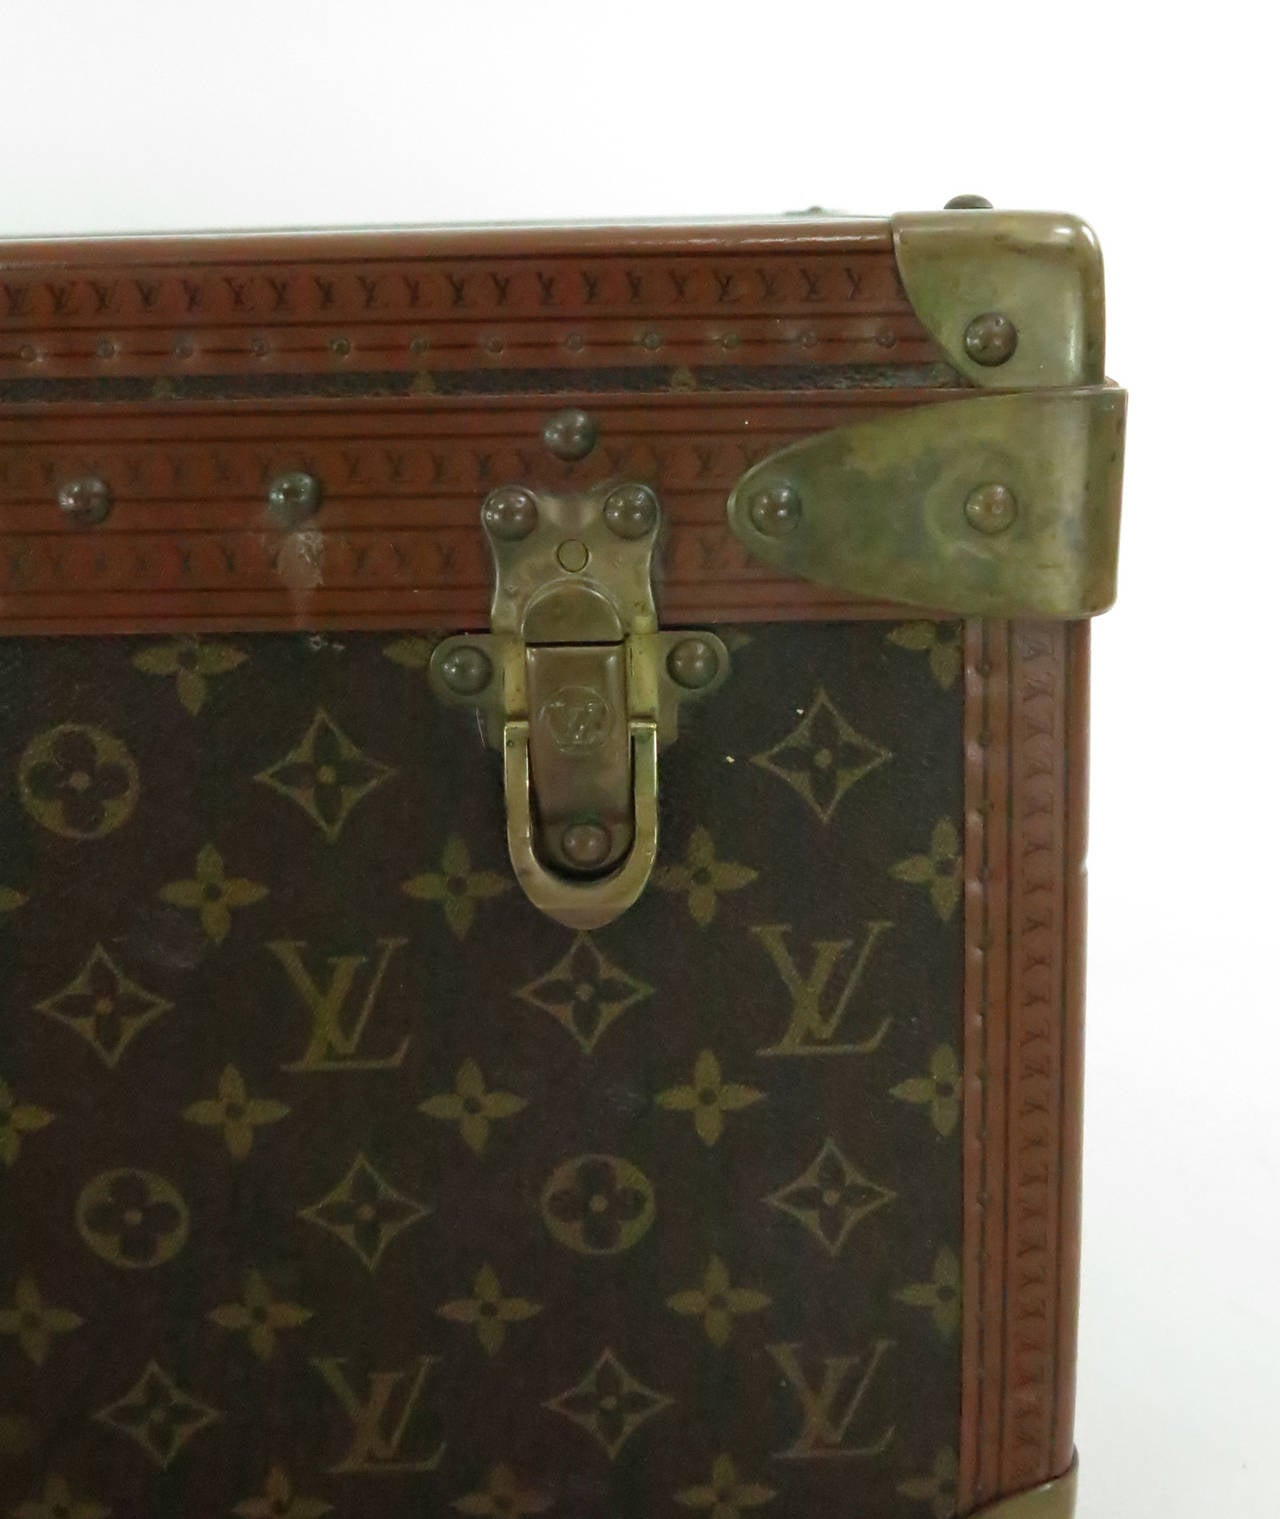 Louis Vuitton Alzar 80 monogram hardside suitcase/trunk 4